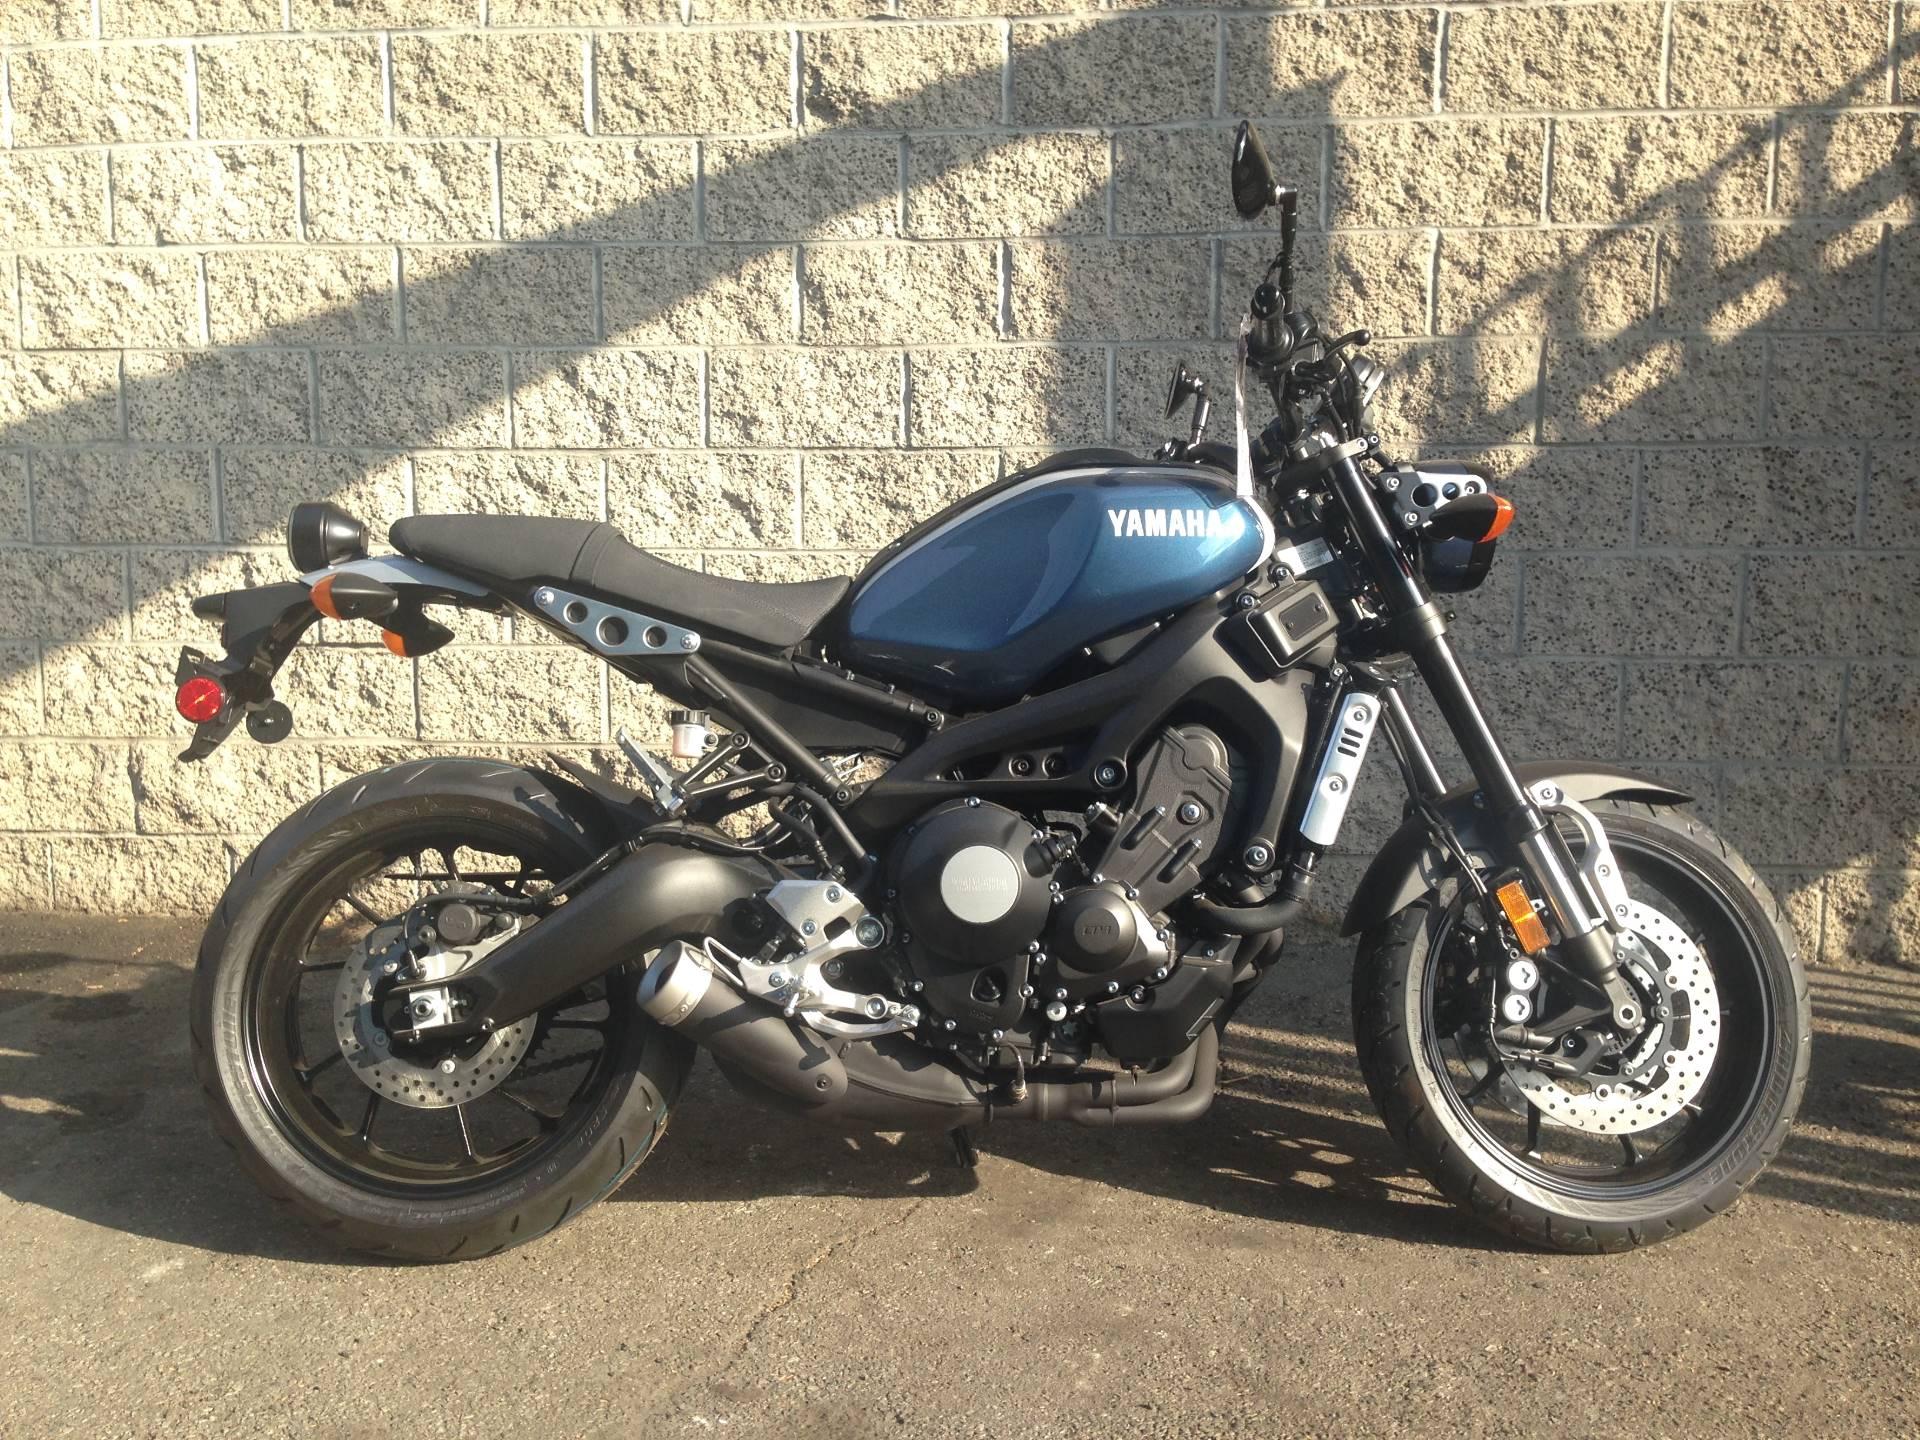 2017 Yamaha XSR900 for sale 8429